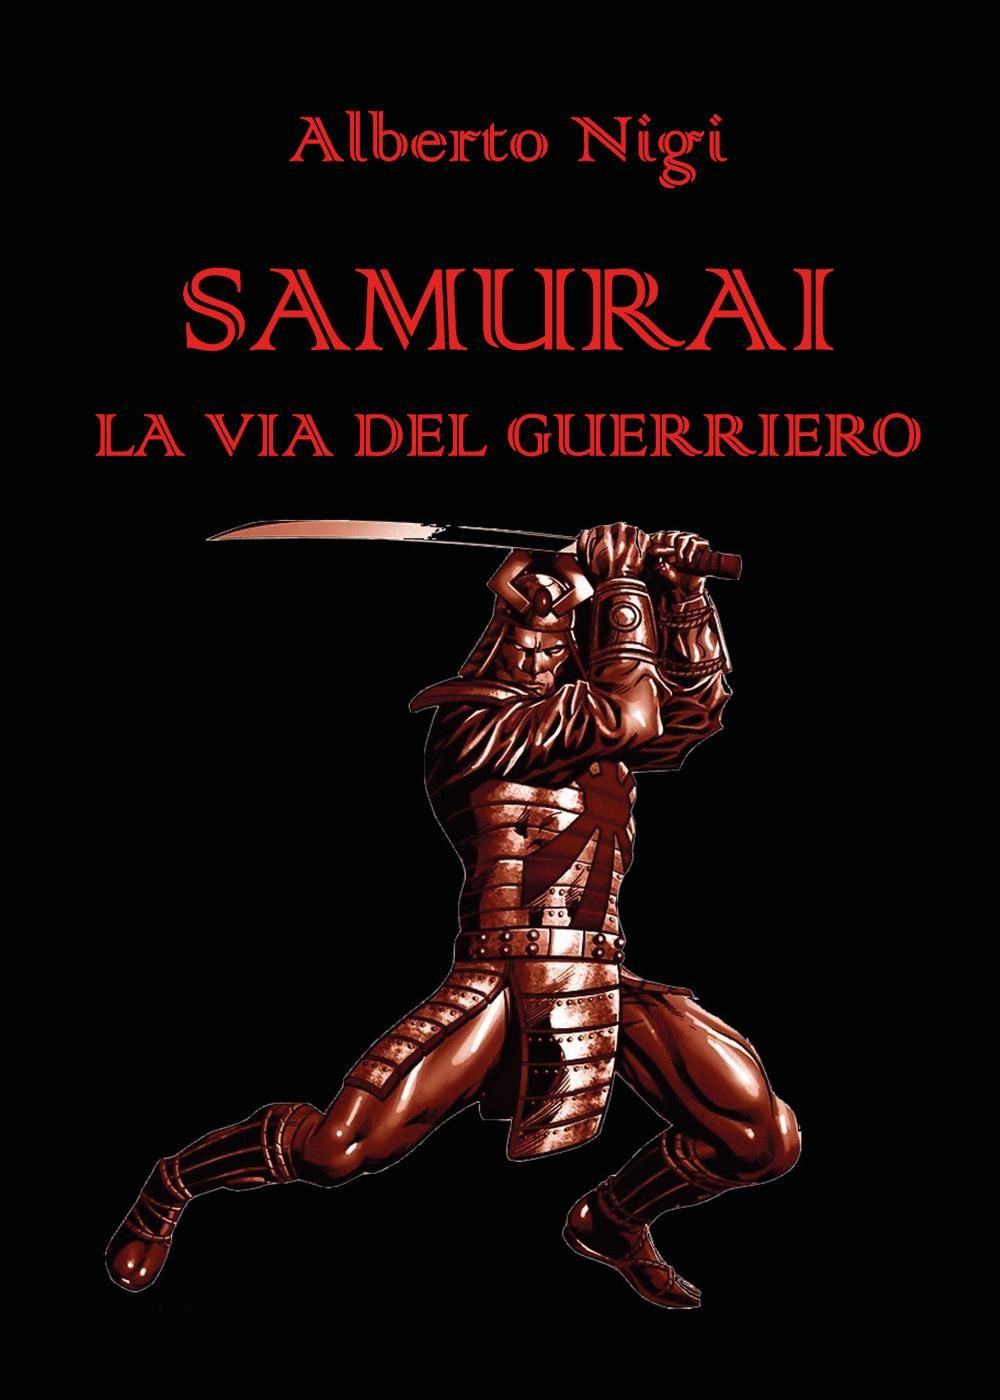 Samurai - La Via del Guerriero